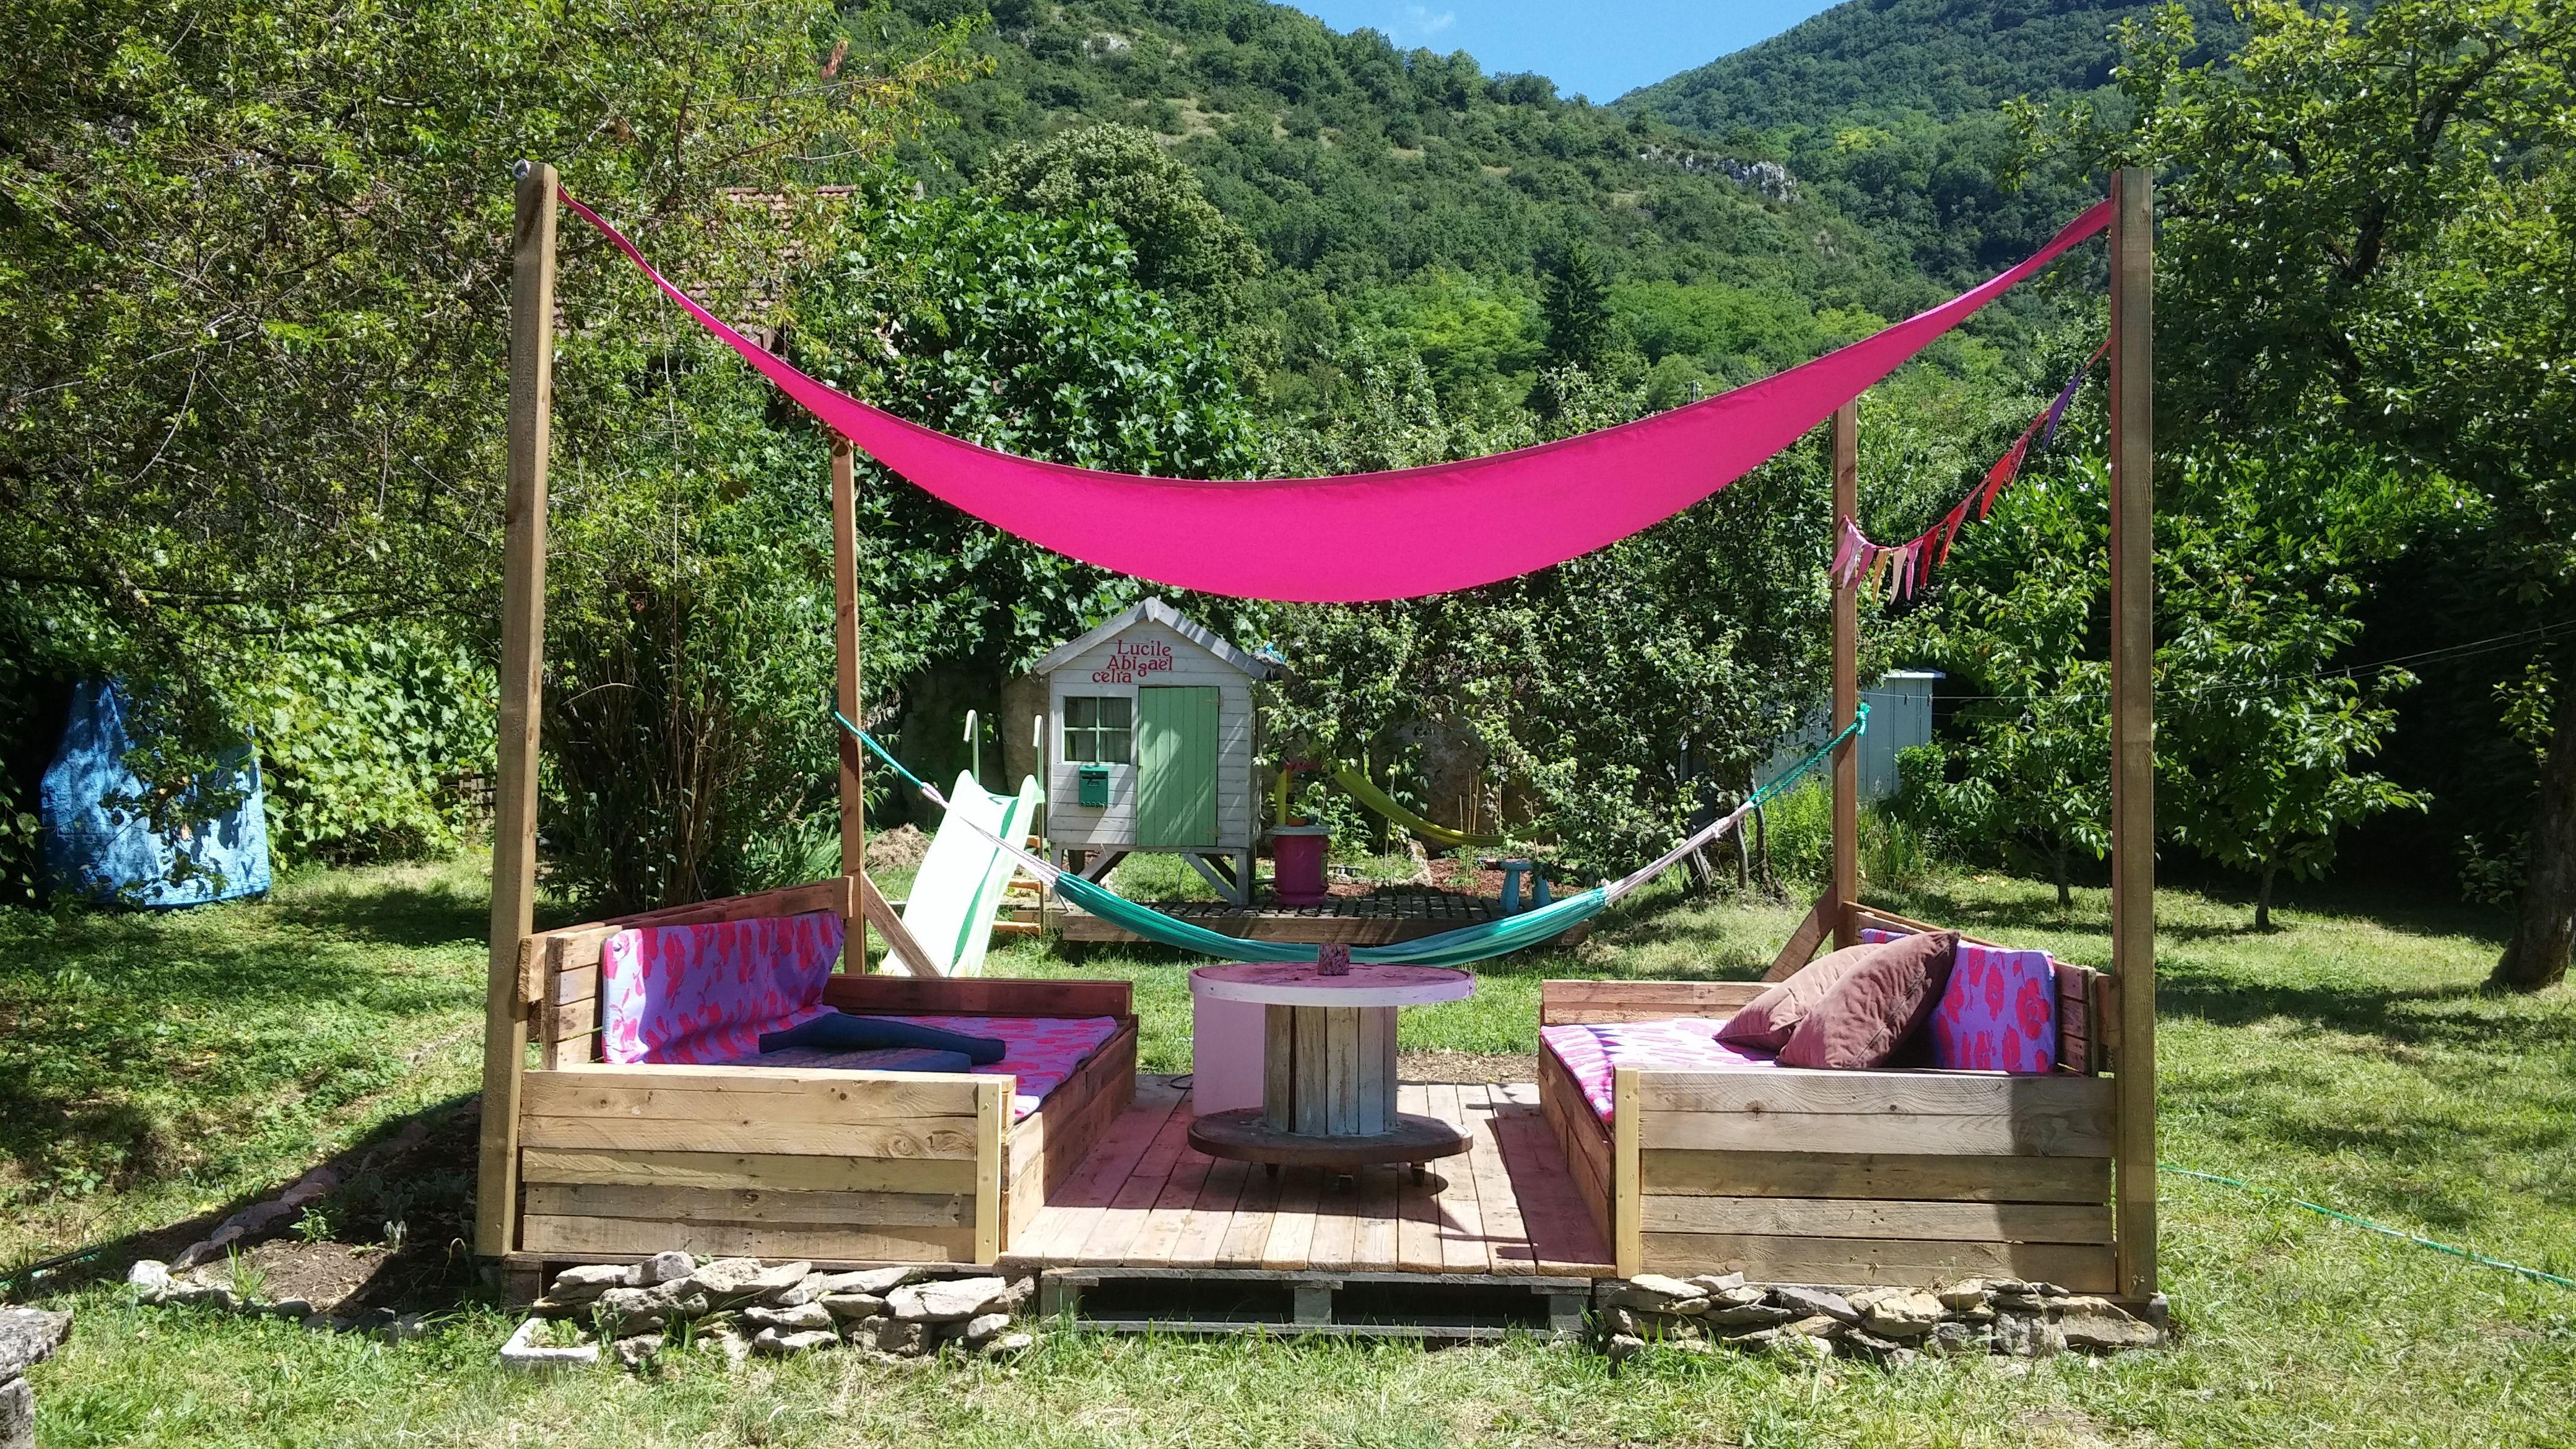 la d tente la tha landaise inspiration diy r cup tuto terrasse palette pergola banquette. Black Bedroom Furniture Sets. Home Design Ideas